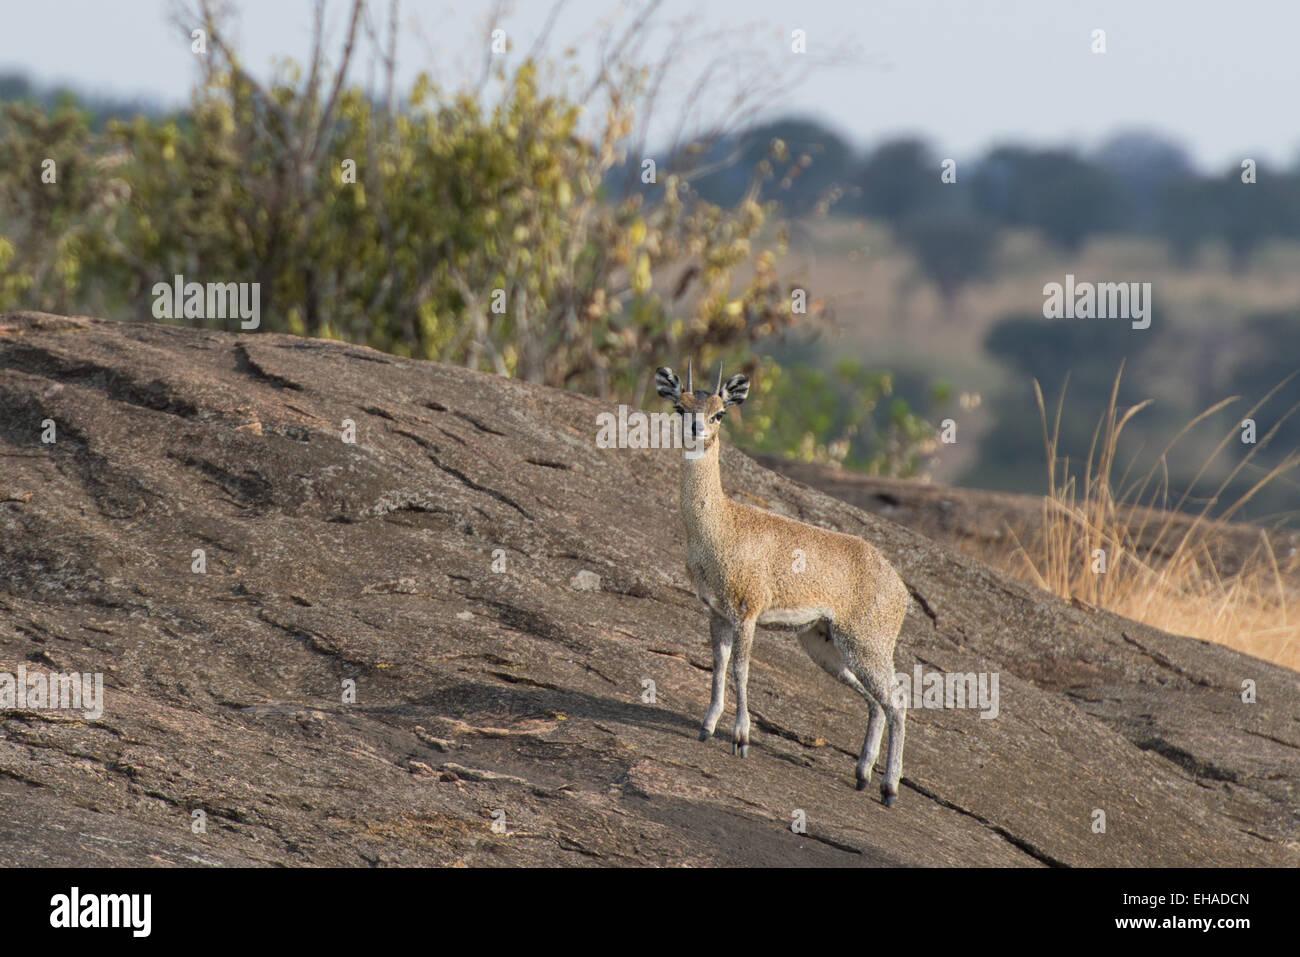 Serengeti NP, Steenbok - Stock Image